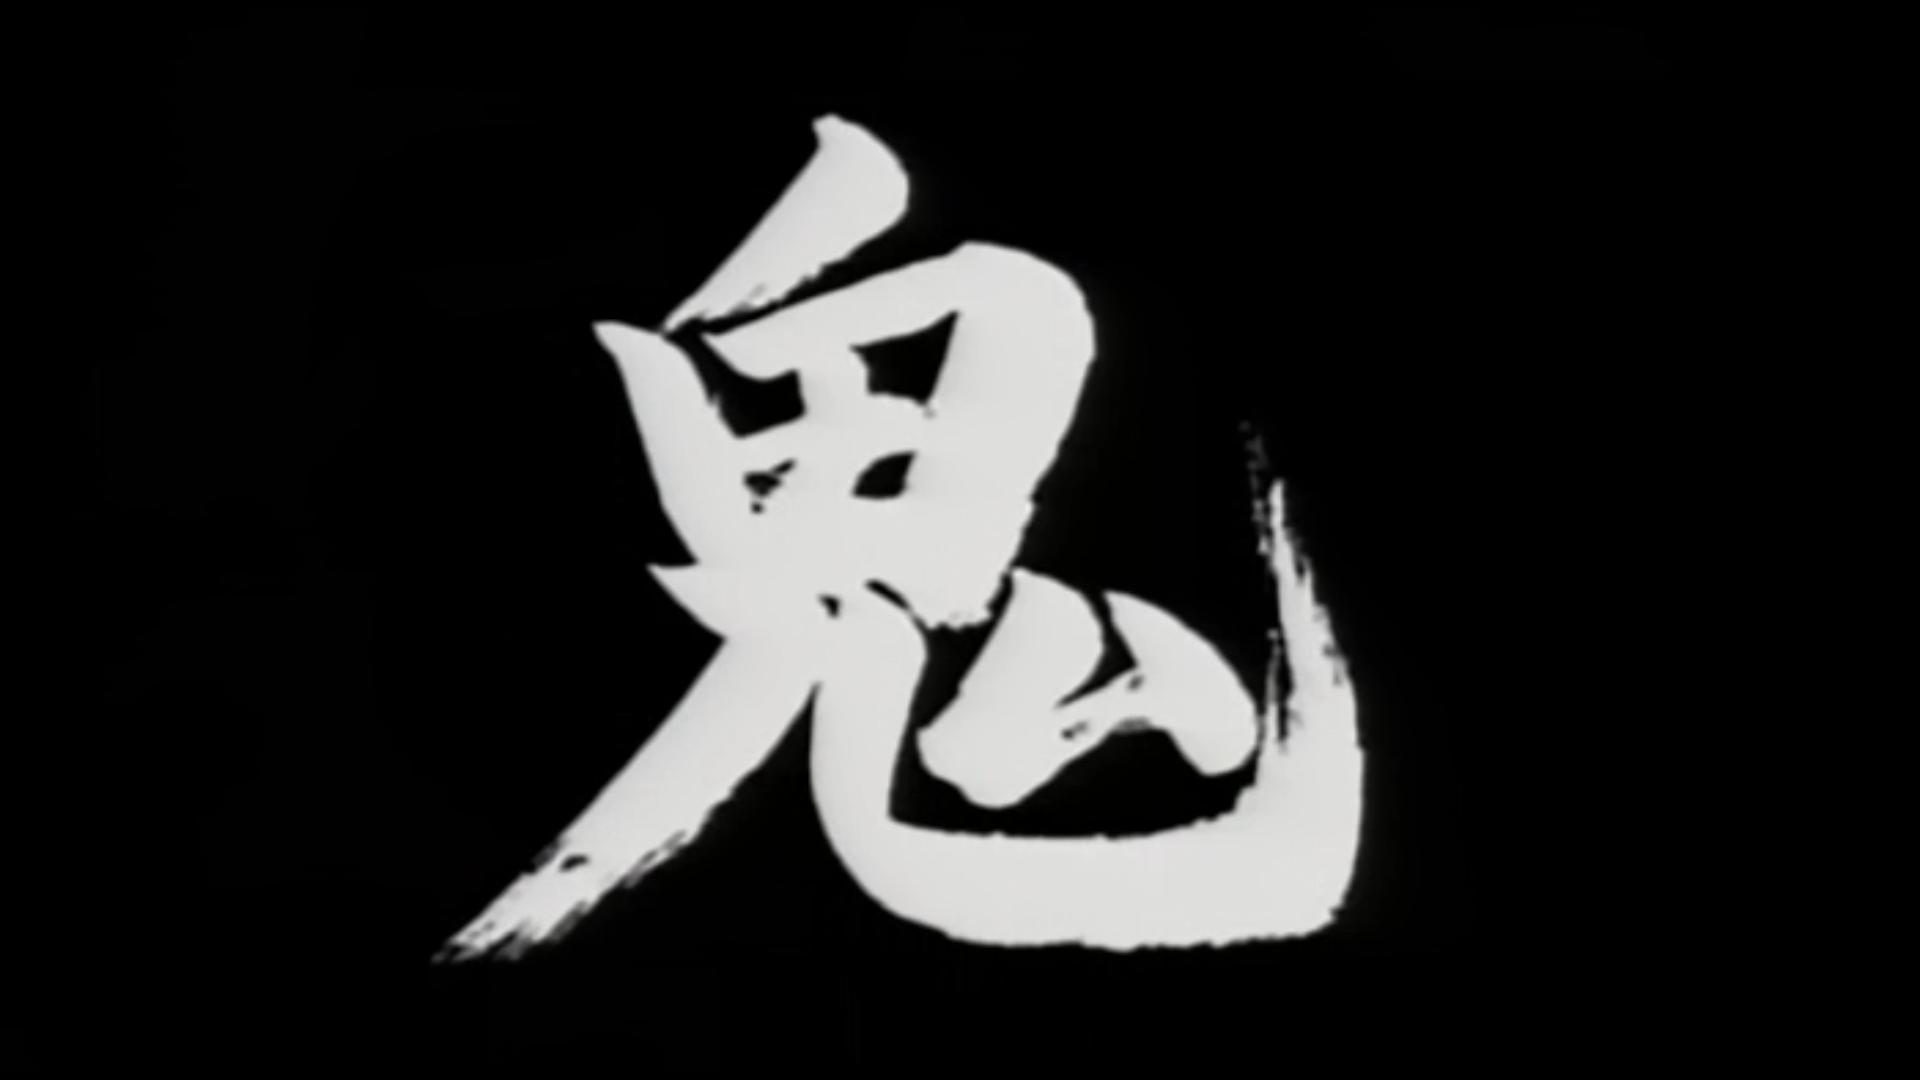 Yukishiro